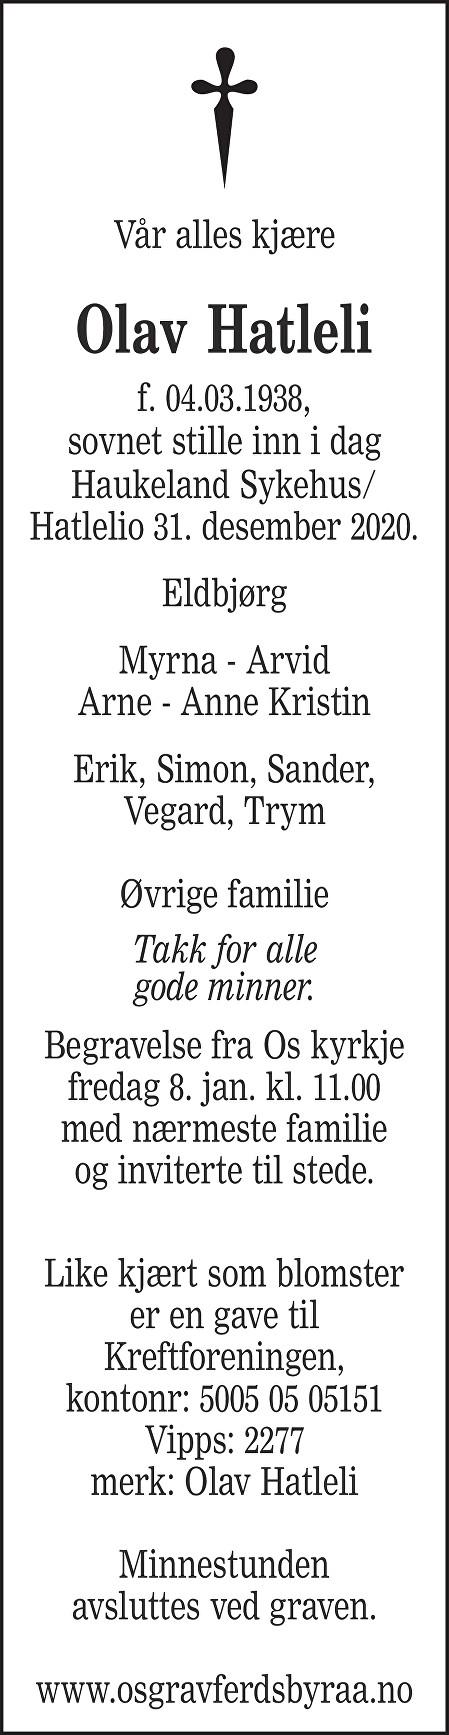 Olav Hatleli Dødsannonse